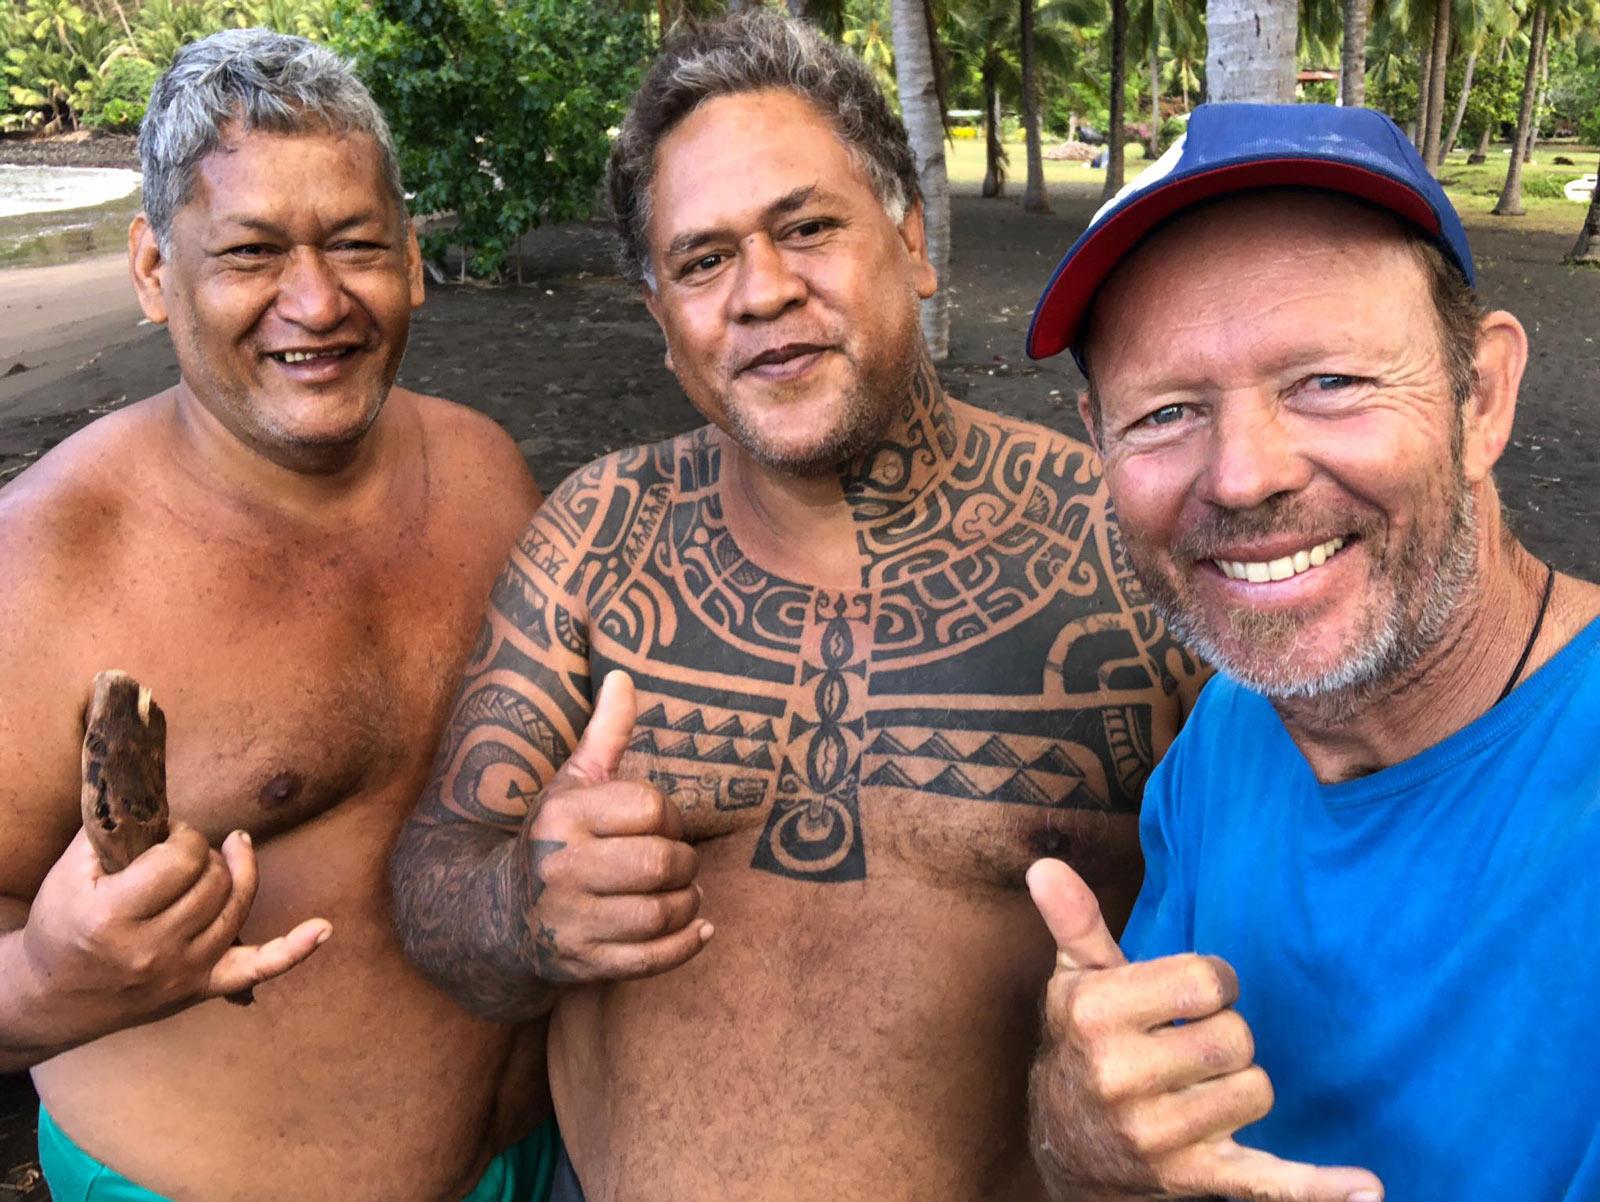 Marquesas-Island-Expedition-Bart-de-Zwarts-Daily-Journal-4